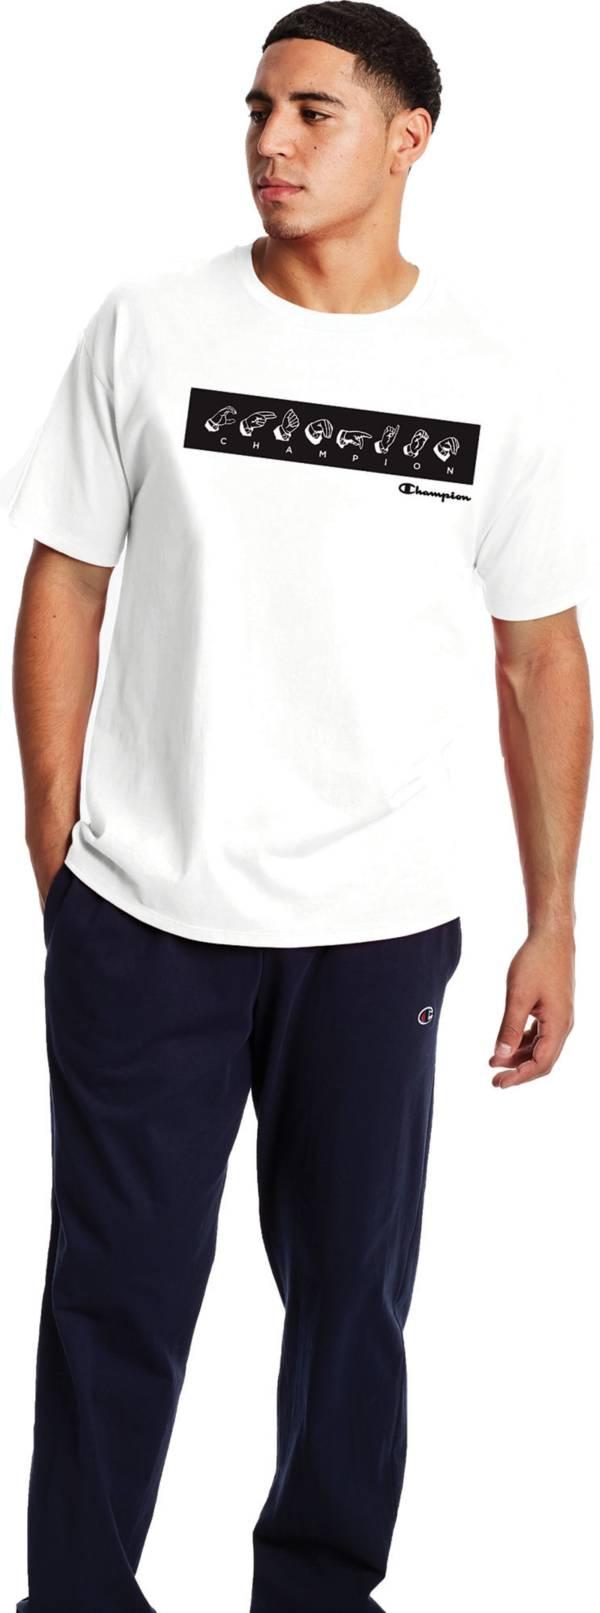 Champion Men's Sign Language Short Sleeve Graphic T-Shirt product image